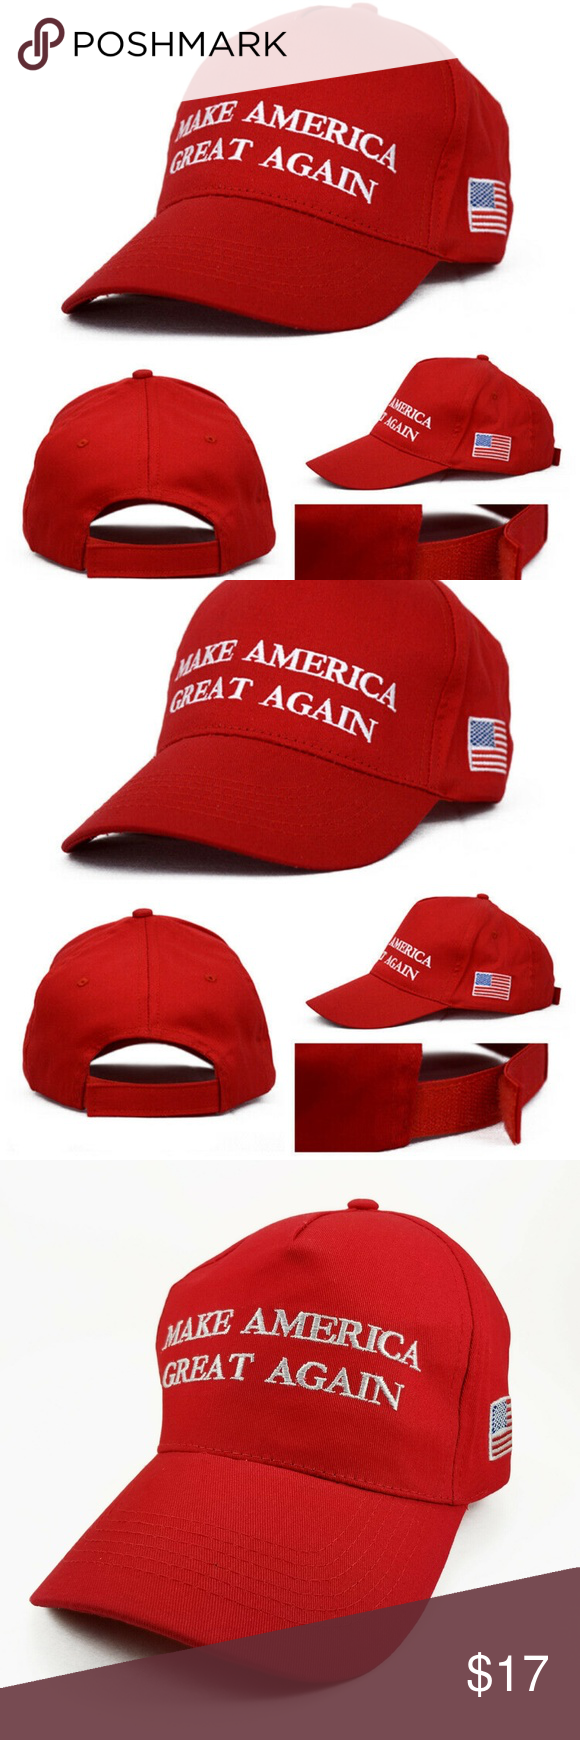 Pin On Election 2020 Merch Hats Shirts Leggings